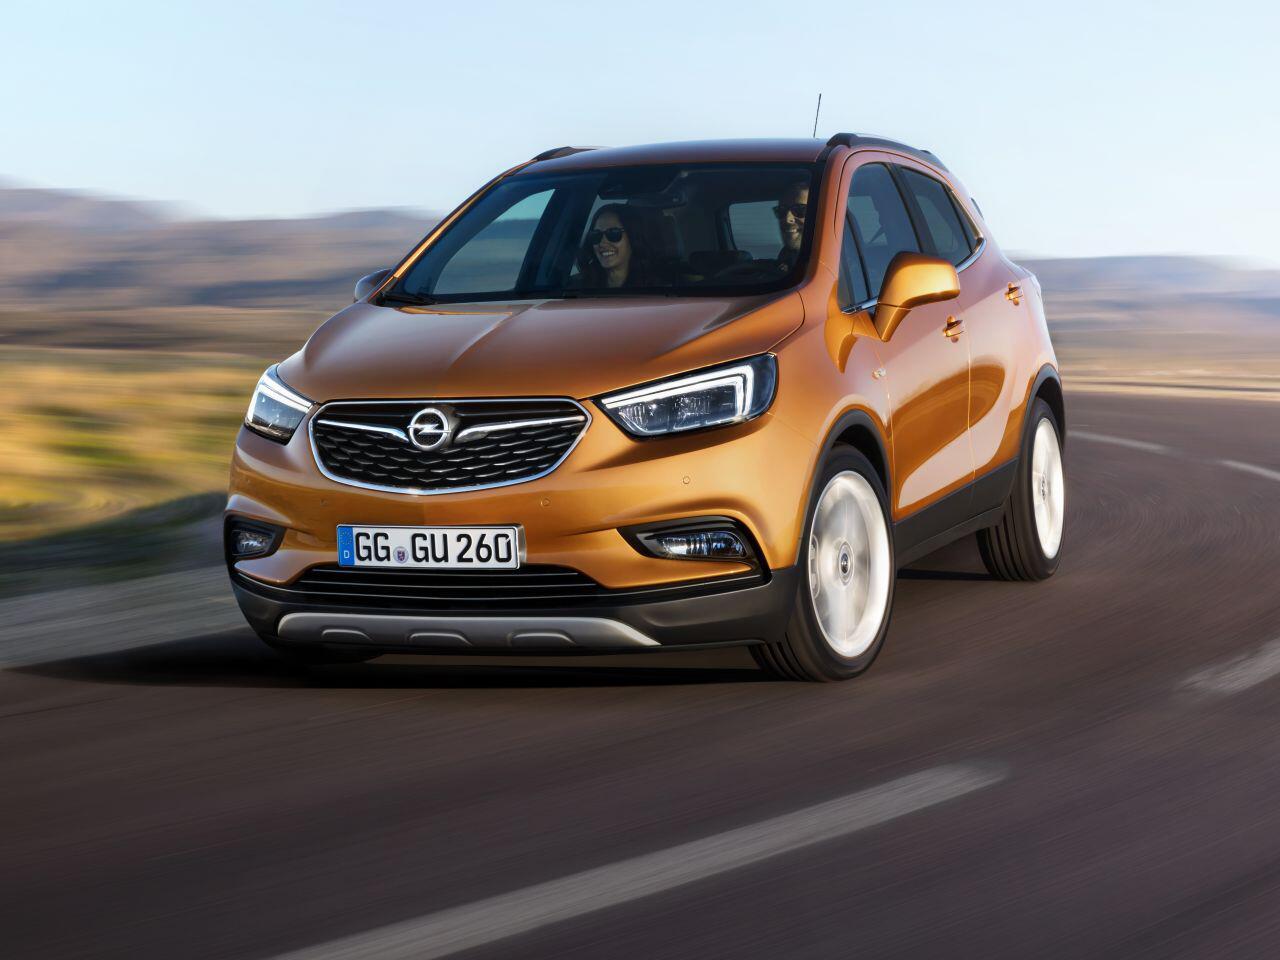 Bild zu Platz 8: Opel Mokka